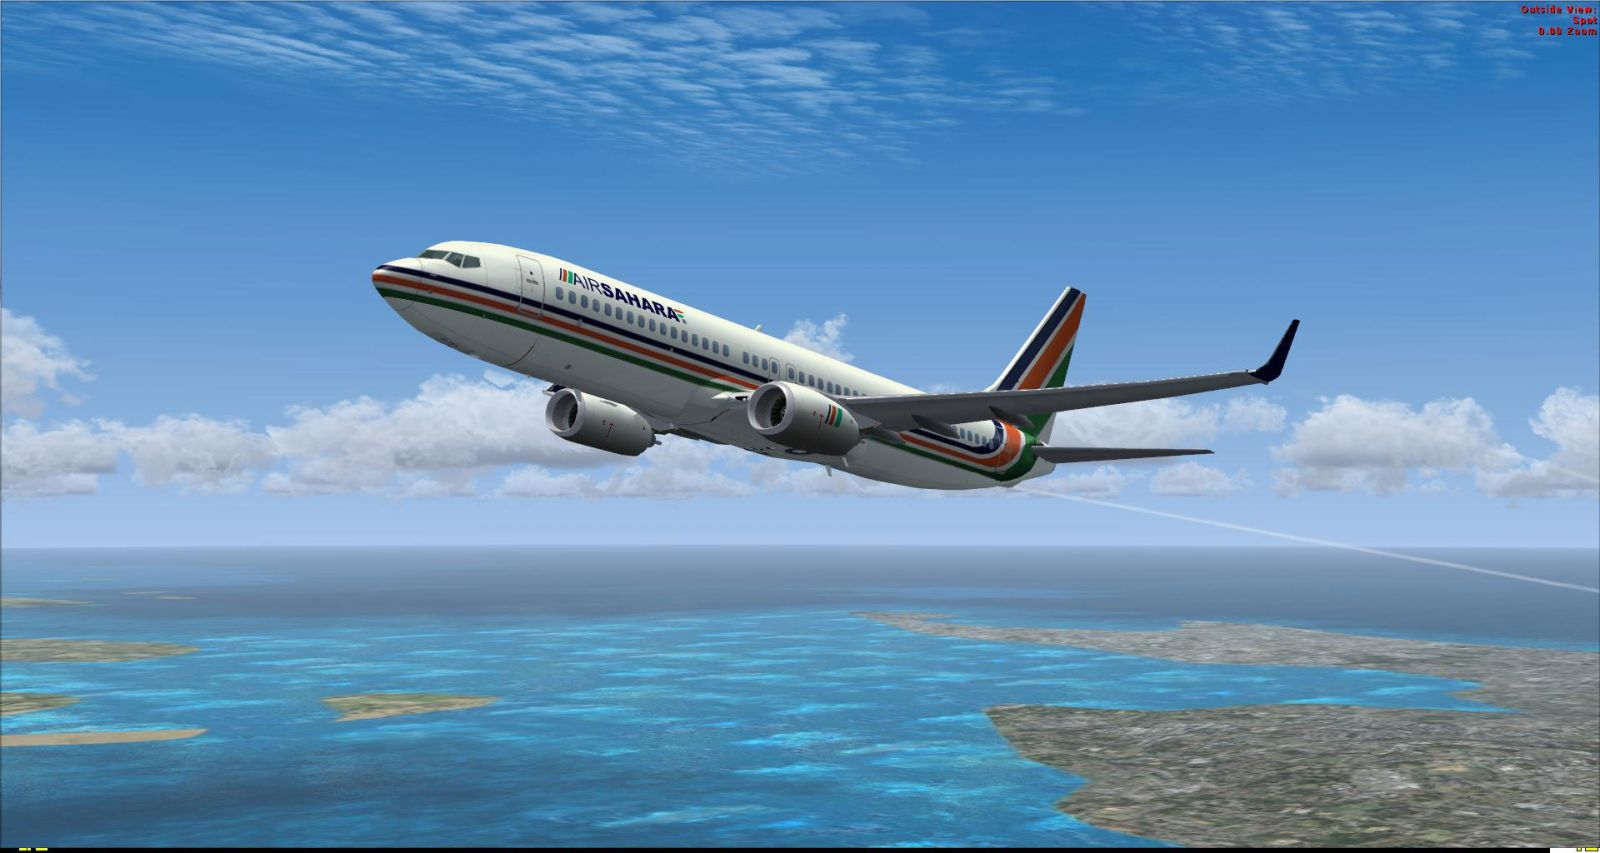 boeing 737 aircraft aviation - photo #36